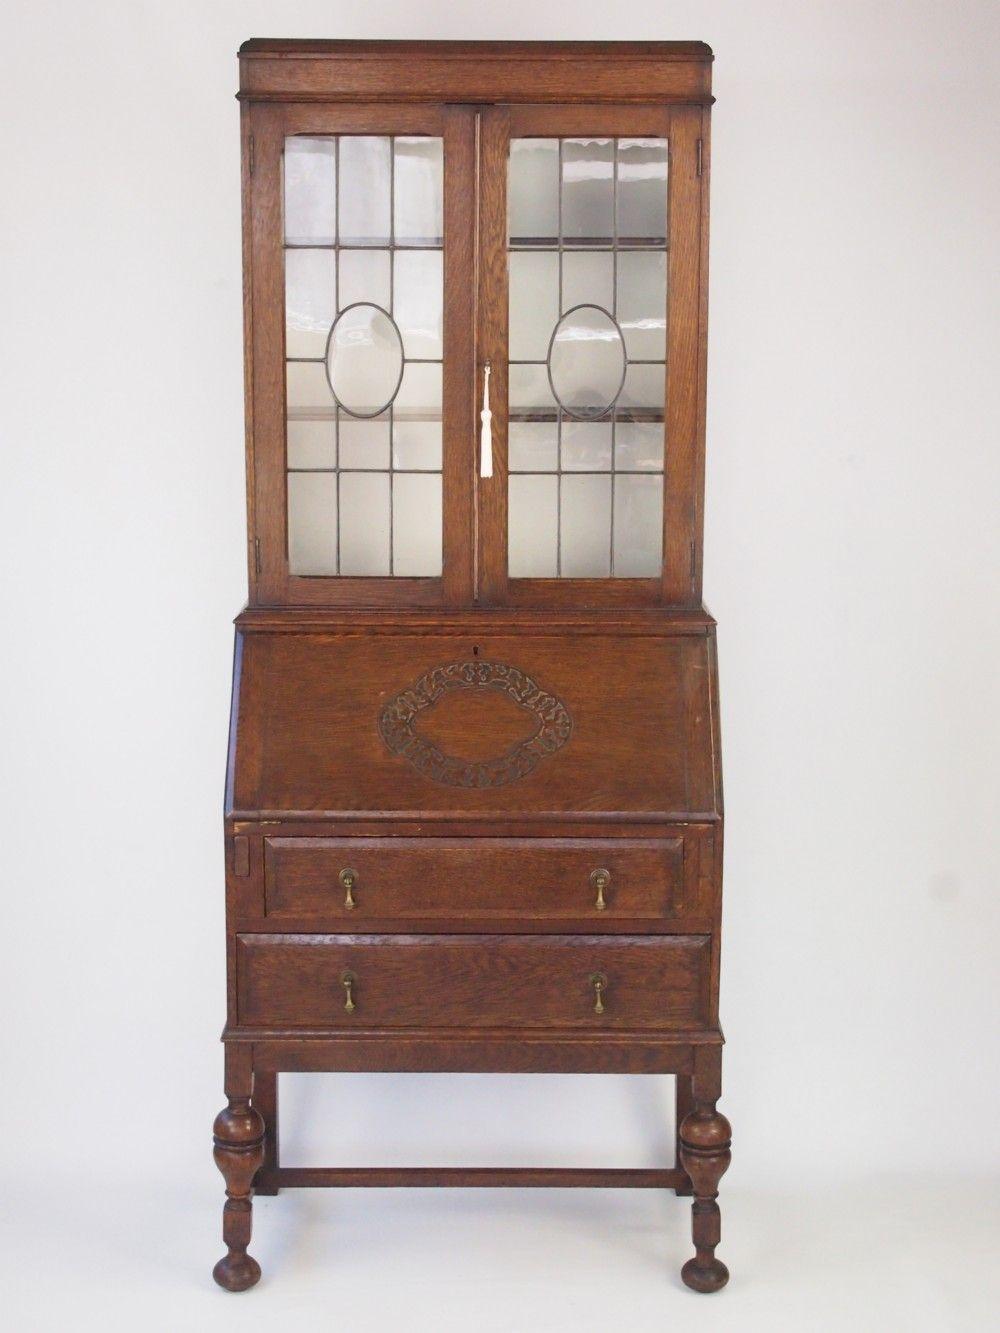 Wonderful Vintage Oak Bureau Bookcase / Writing Desk